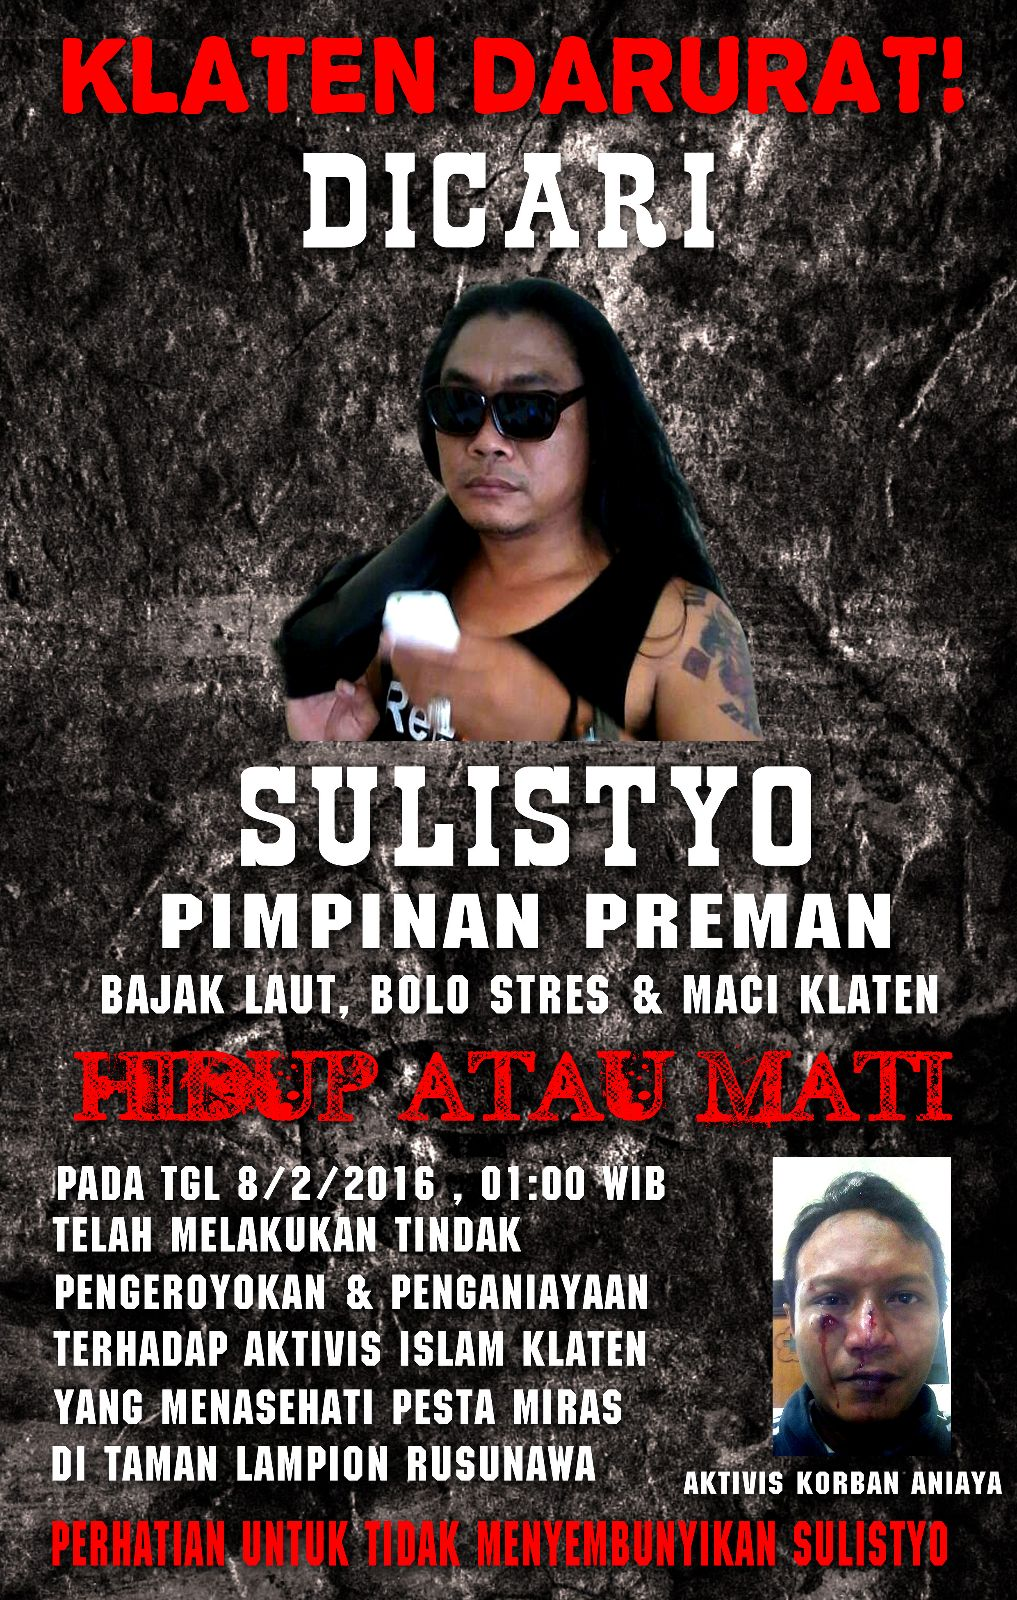 Laskar Islam menyebarkan pengumuman untuk mencari Gembong Preman, Sulistyo, karena diduga telah melakukan penganiayaan terhadap laskar Islam